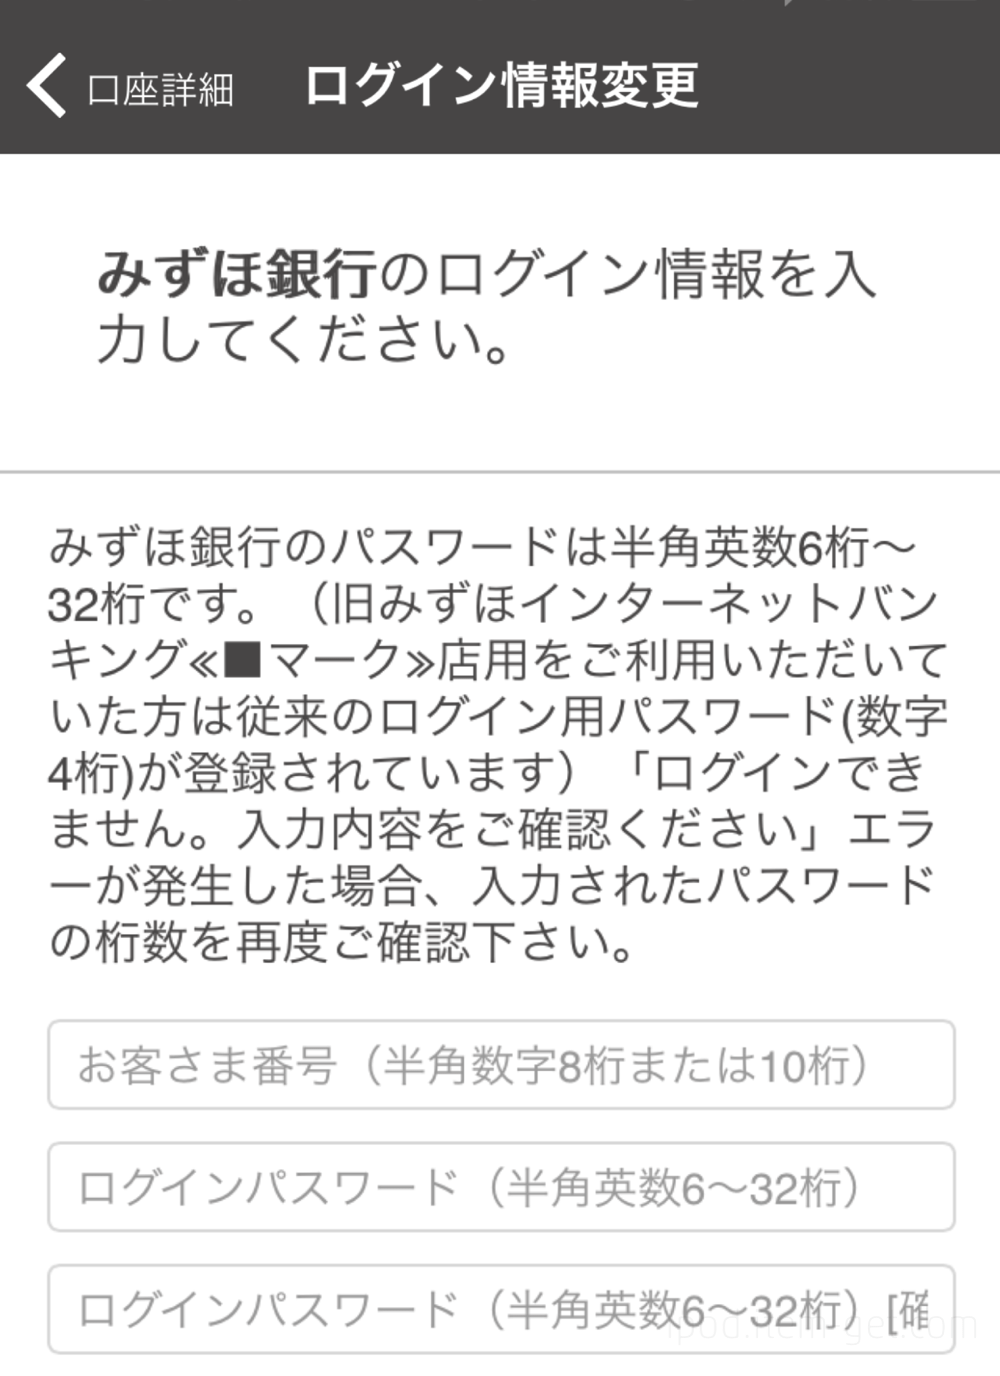 MoneyLook for iOS meisai 03